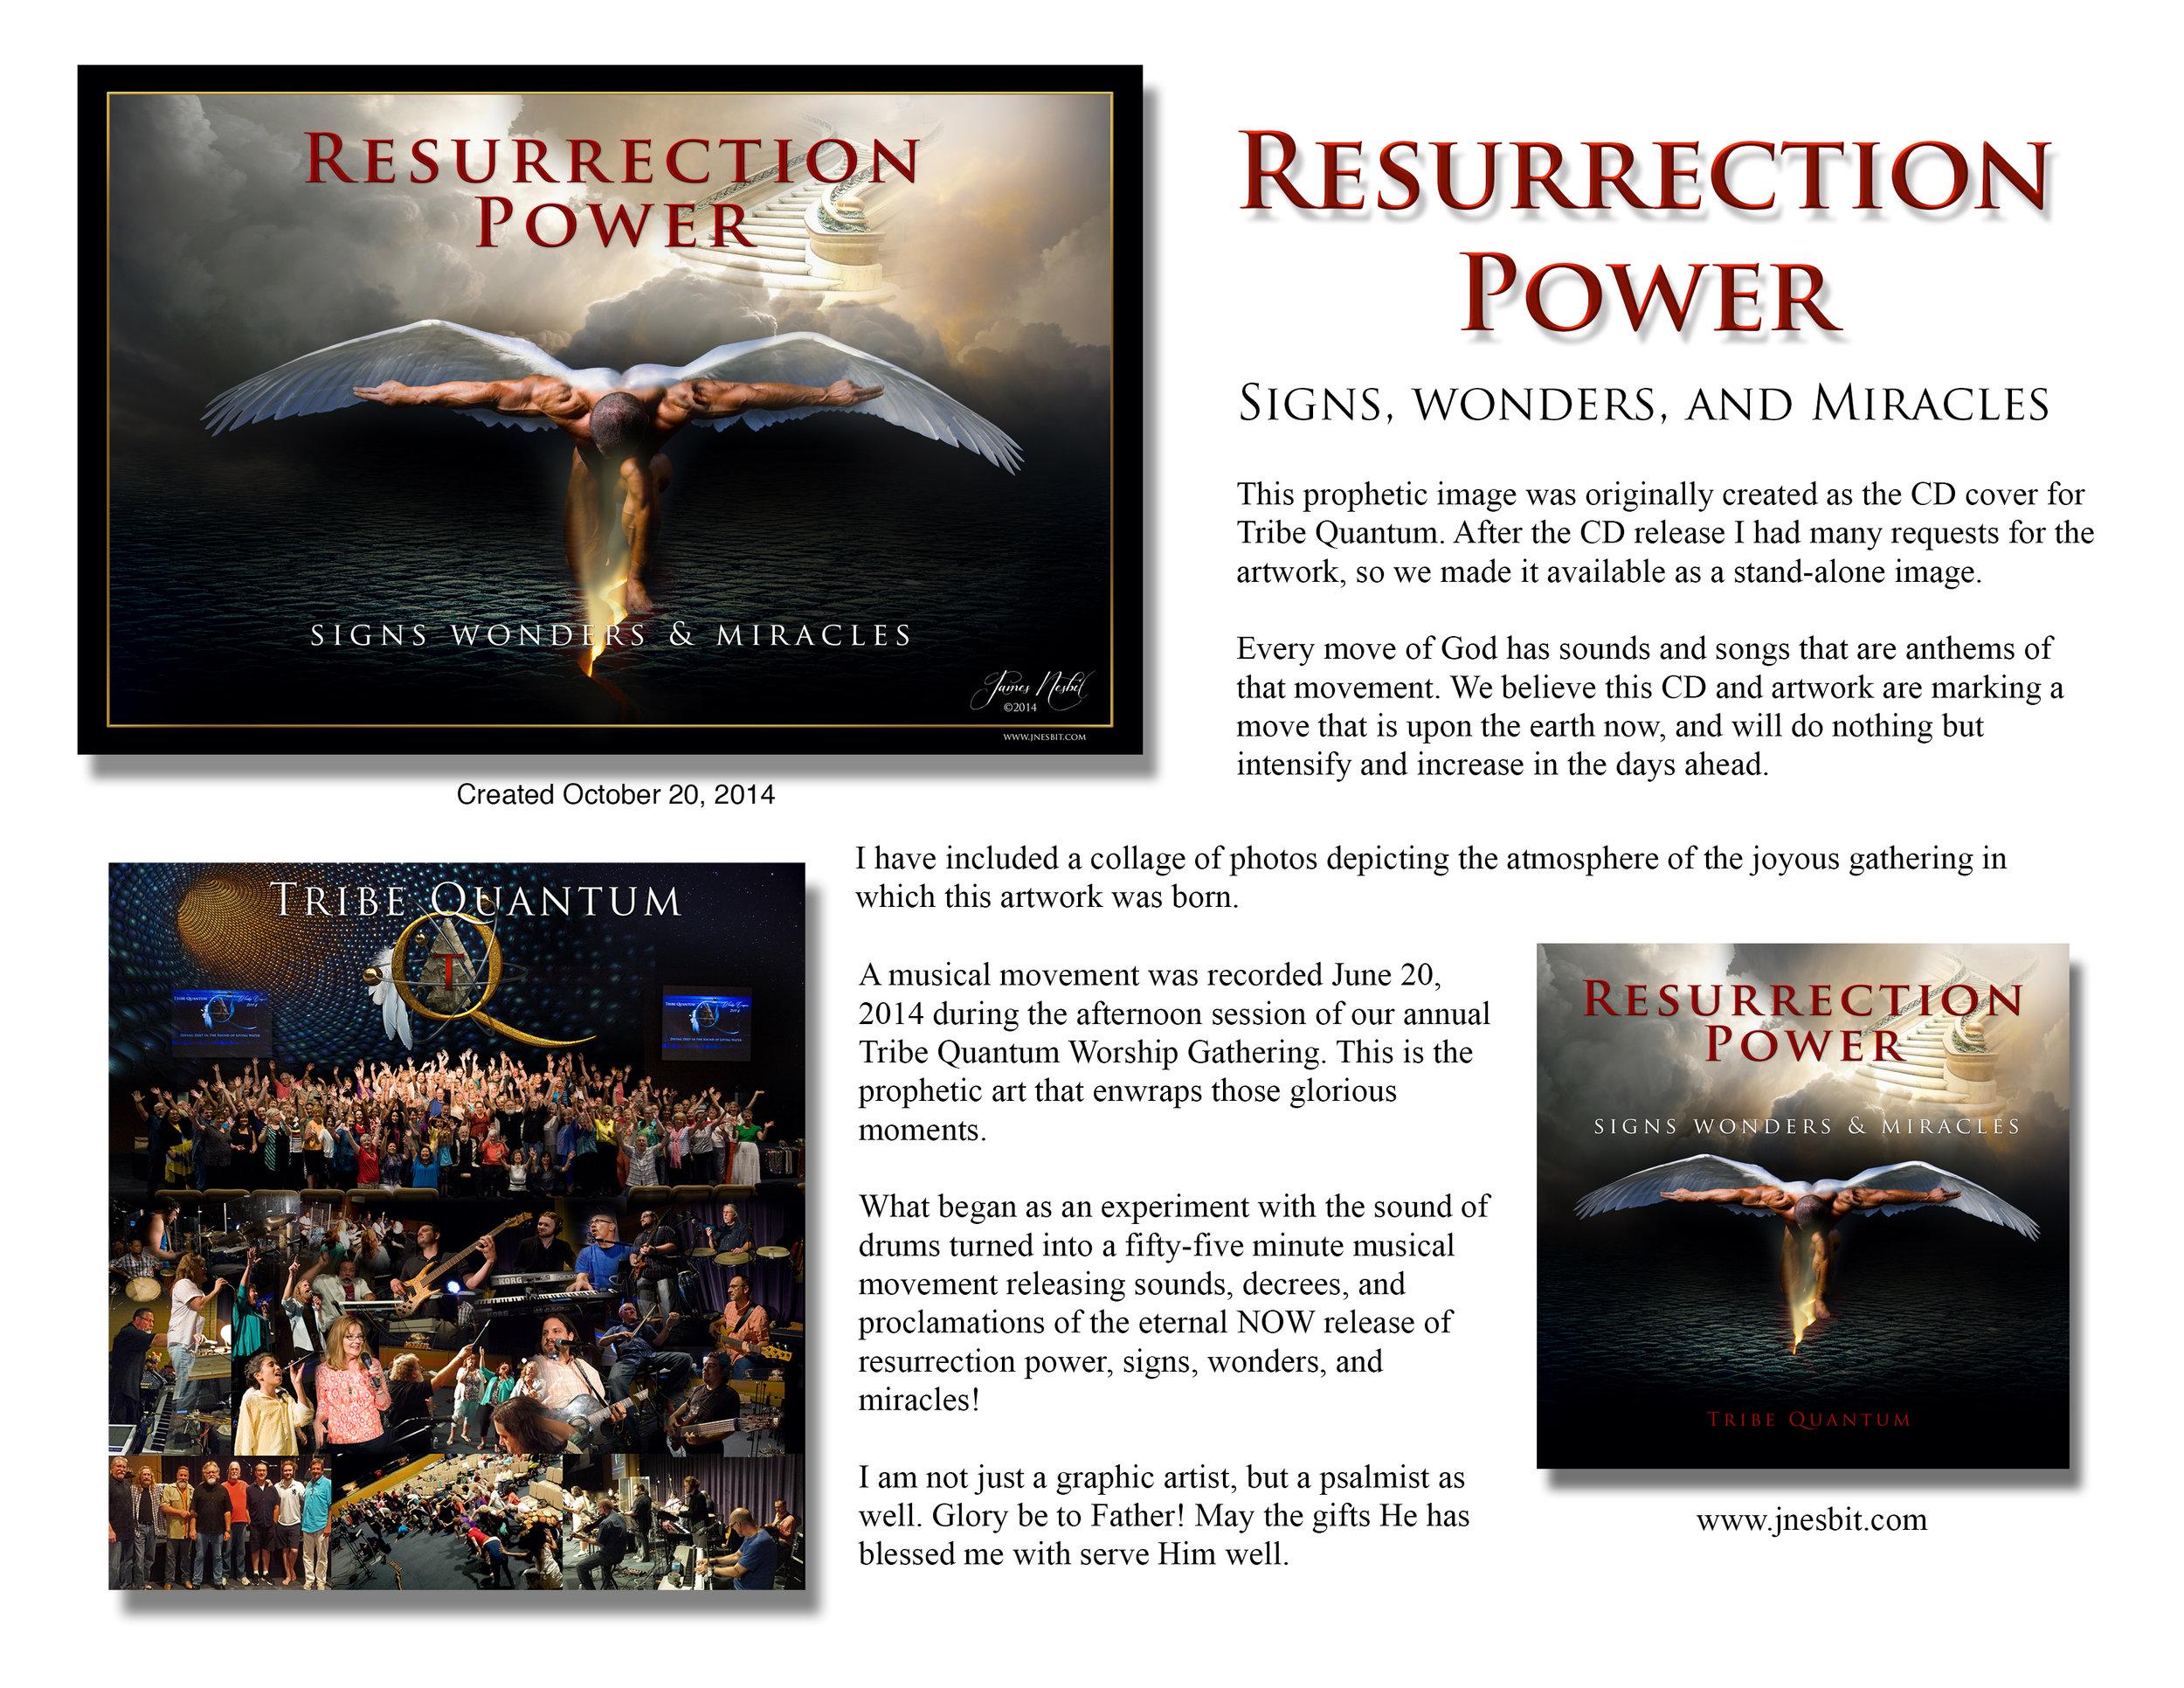 Resurrection Power Description copy.jpg